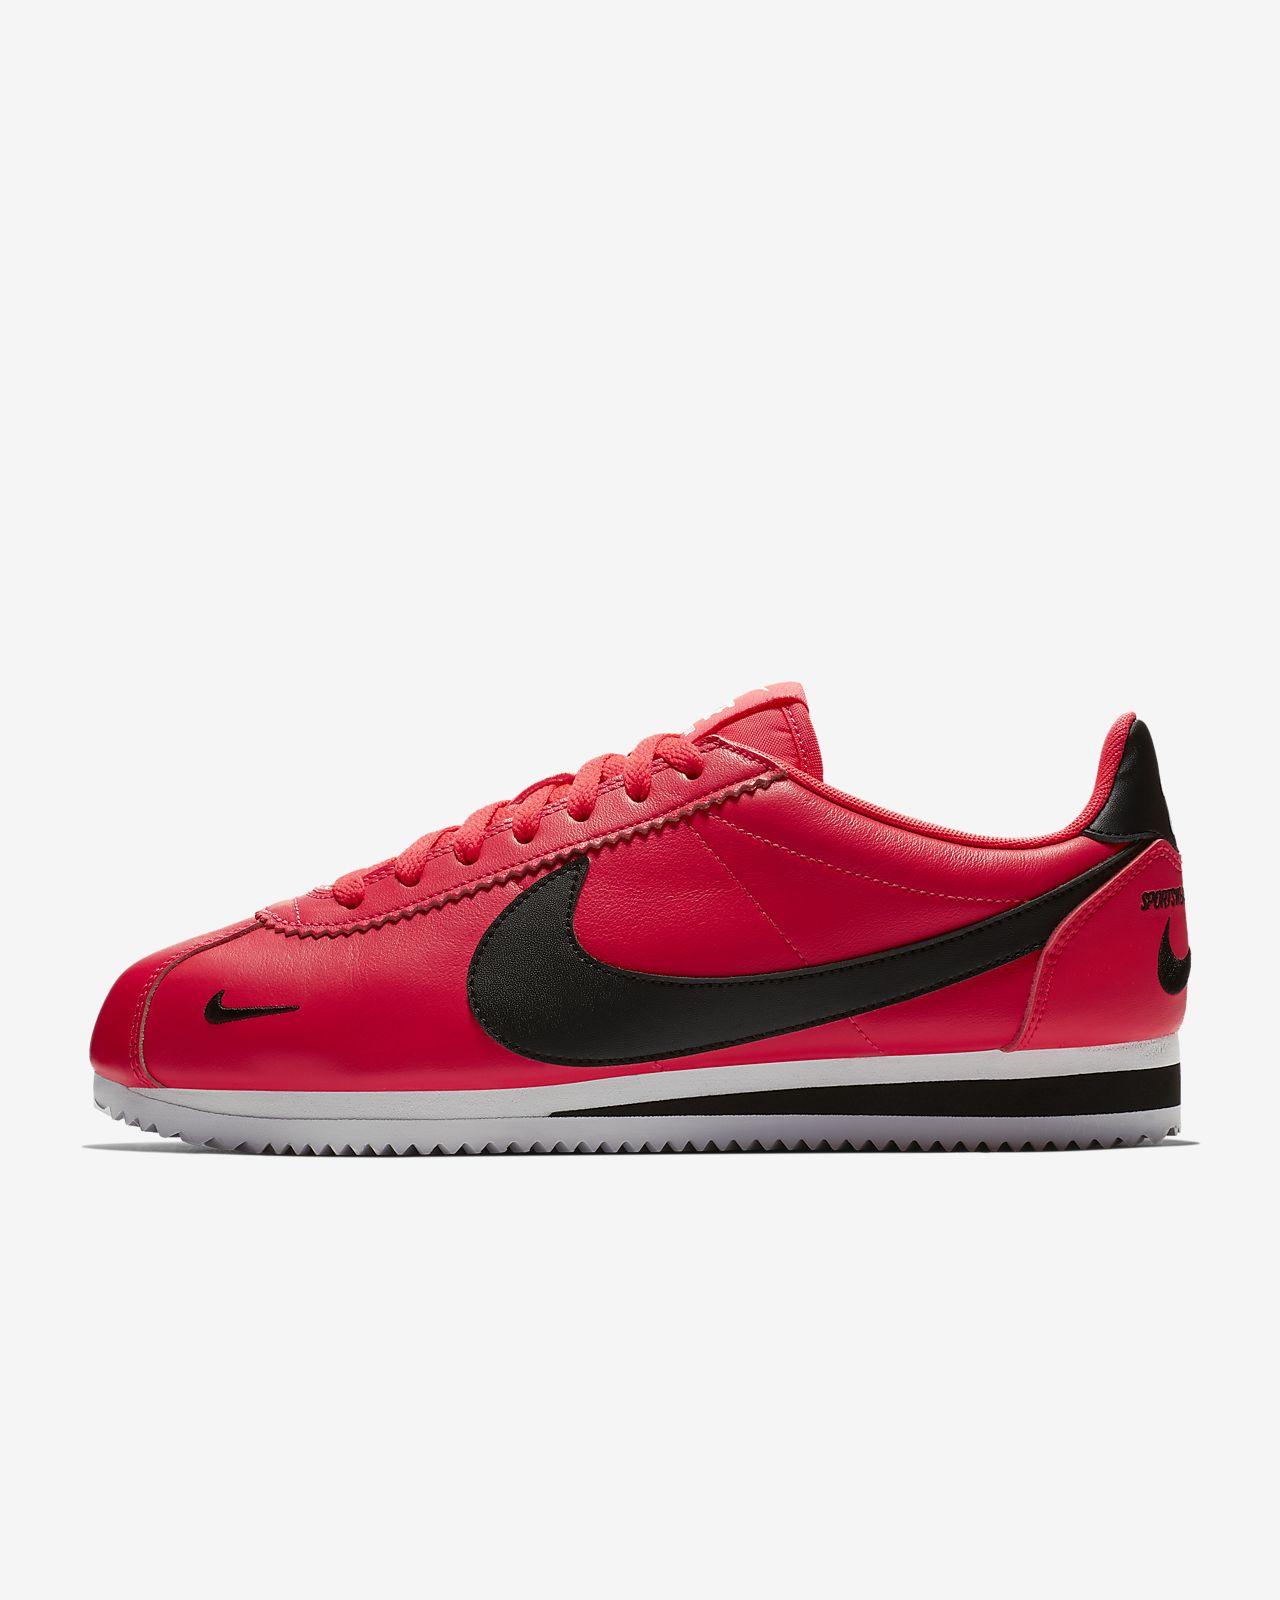 Cortez Calzado Cl Unisex Premium Nike Classic PaRYF